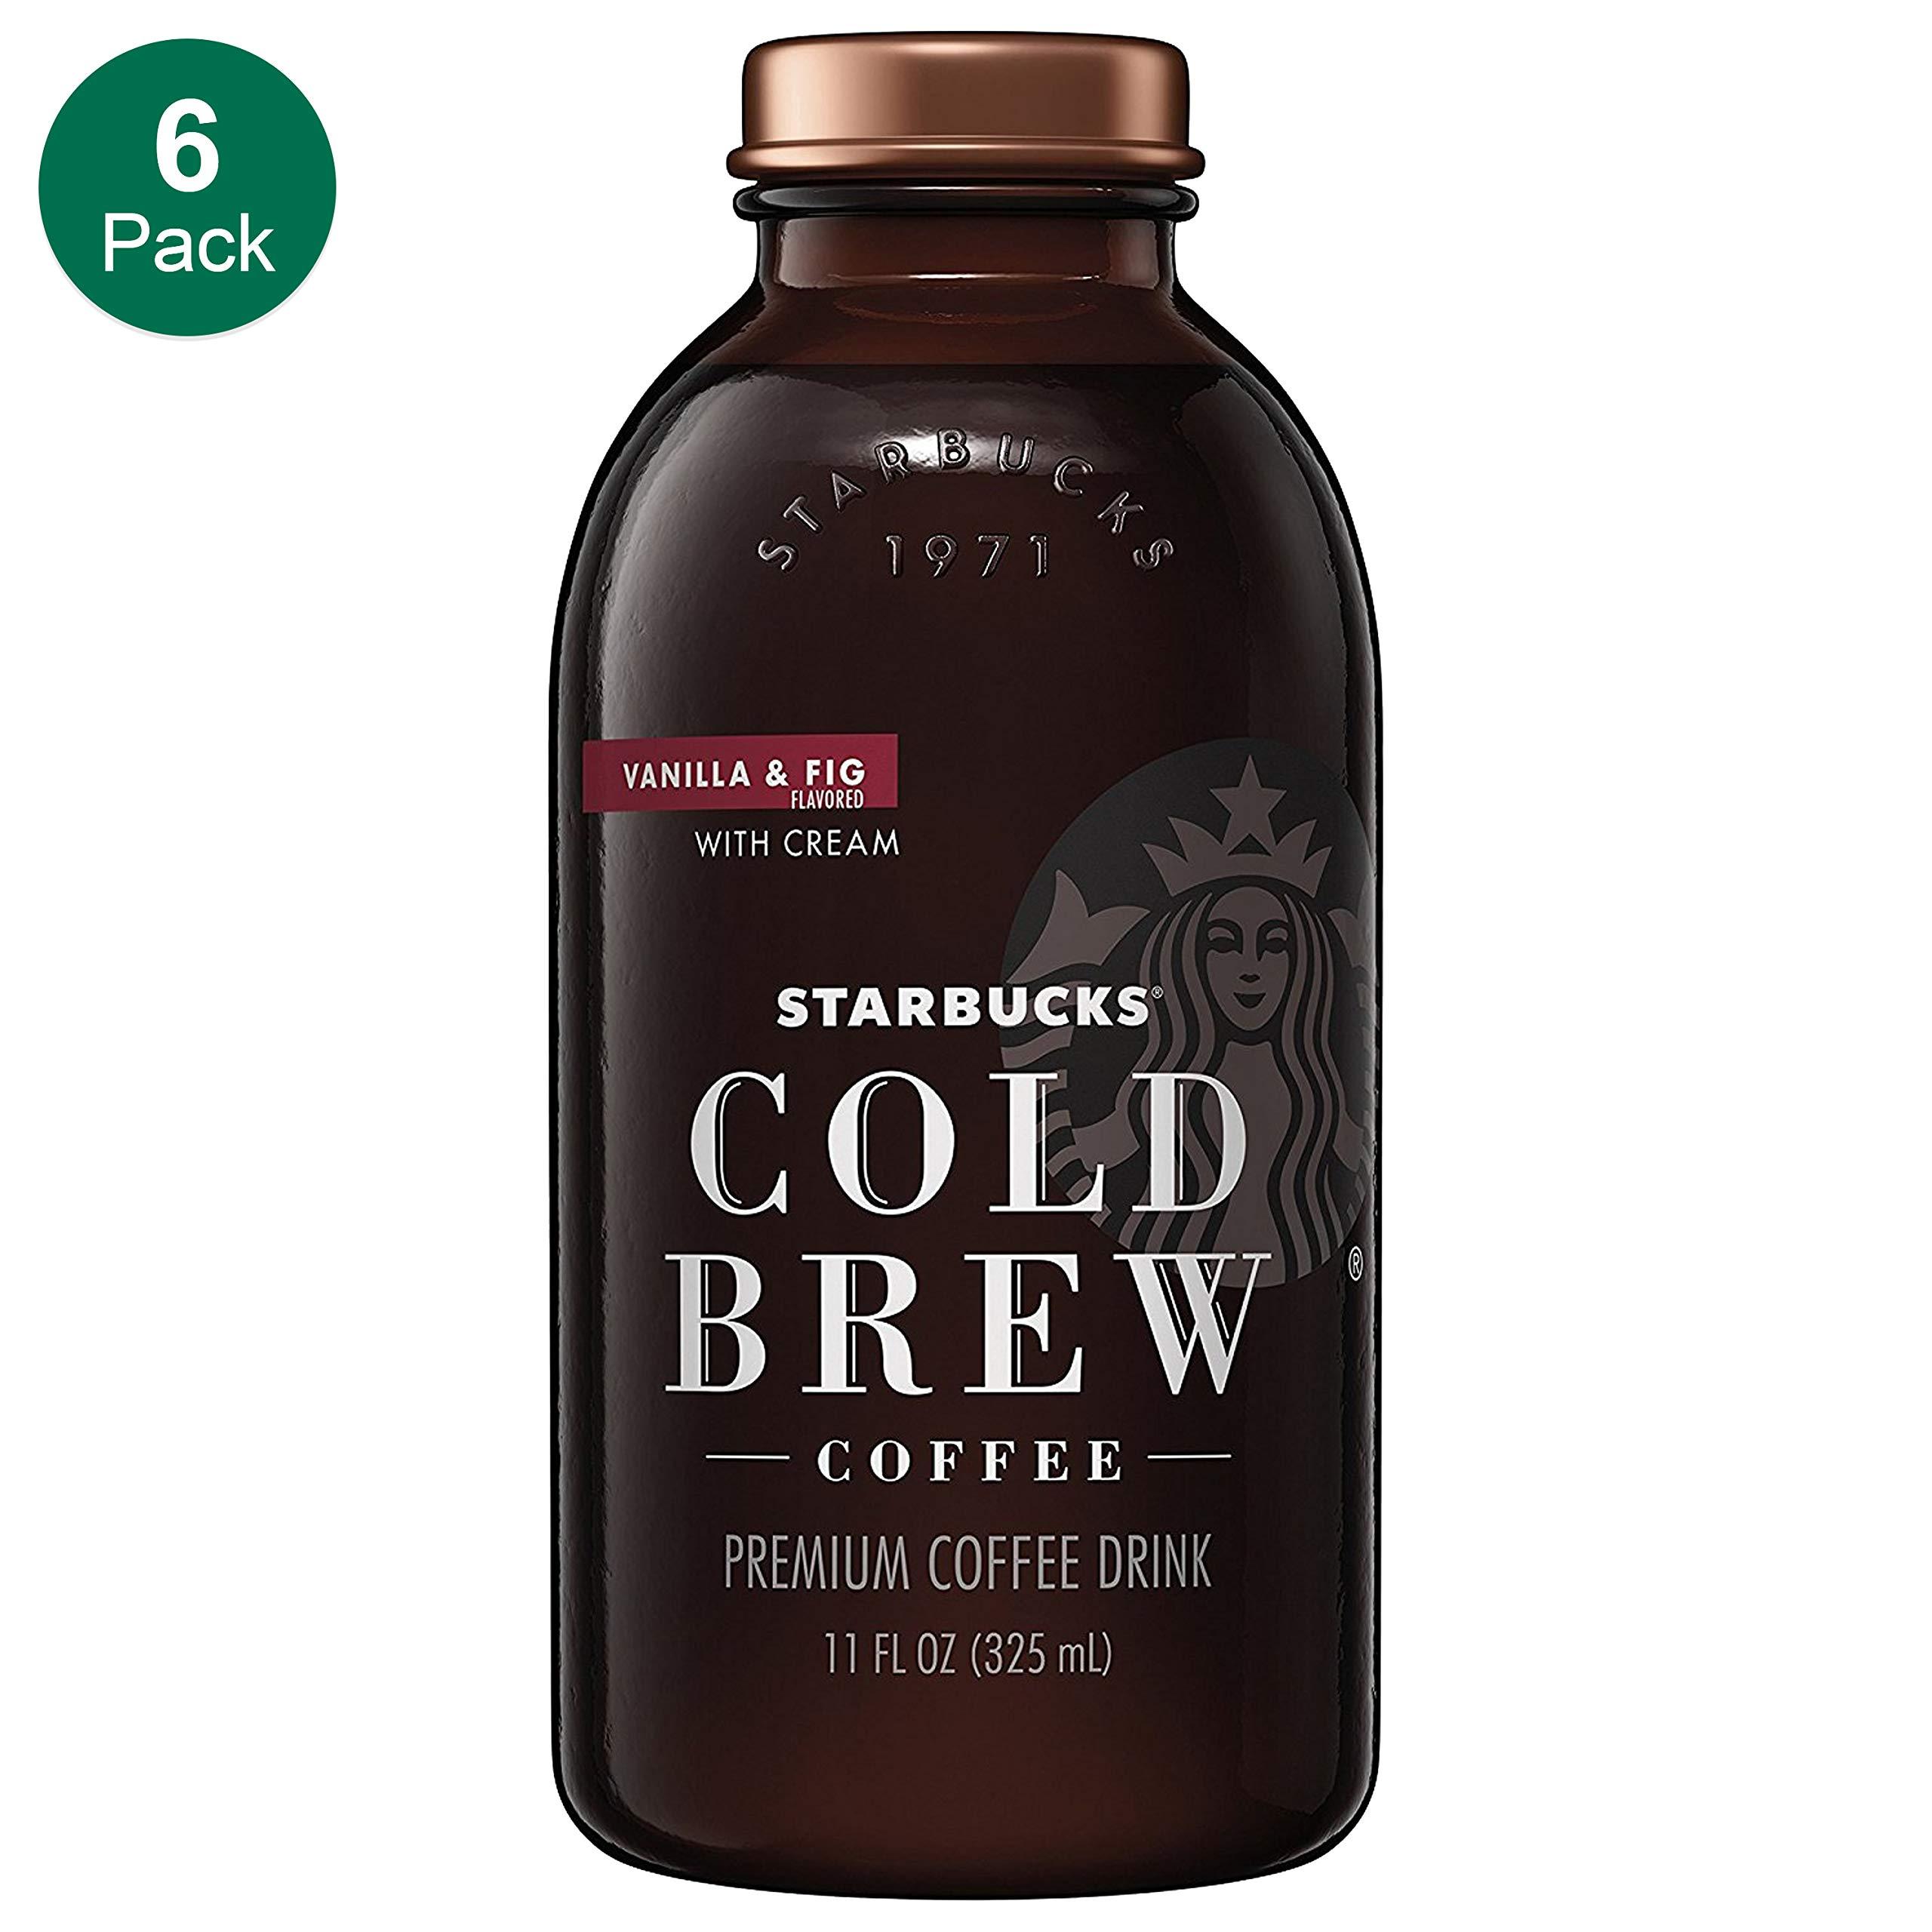 Starbucks, Cold Brew, Vanilla Fig & Cream, 11 fl oz. glass bottles (6 Pack) by Starbucks